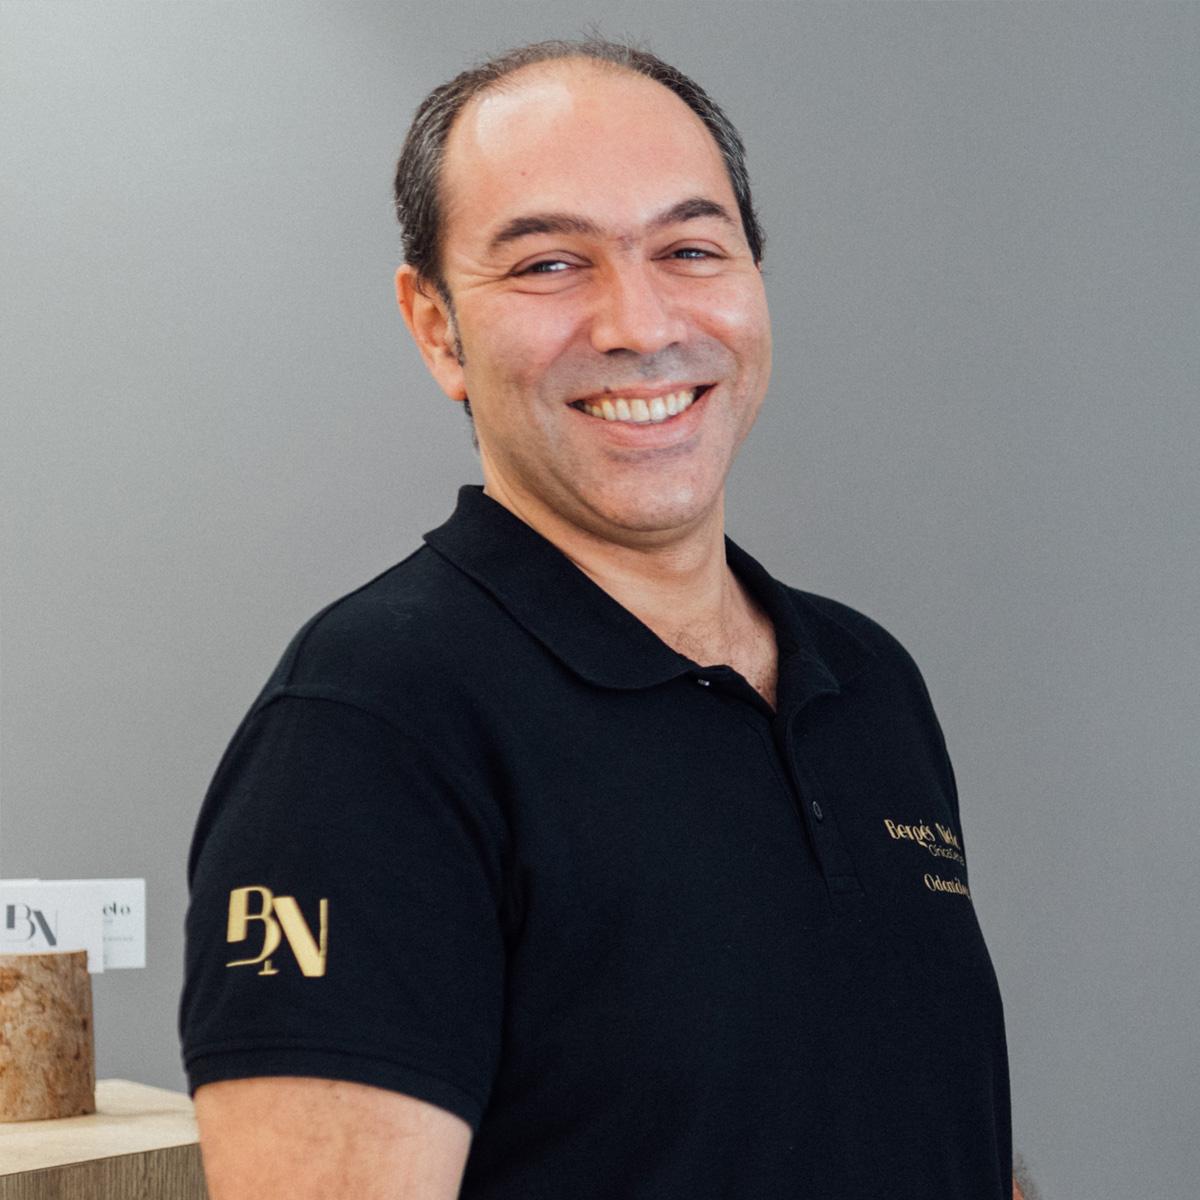 Antonino Nucera